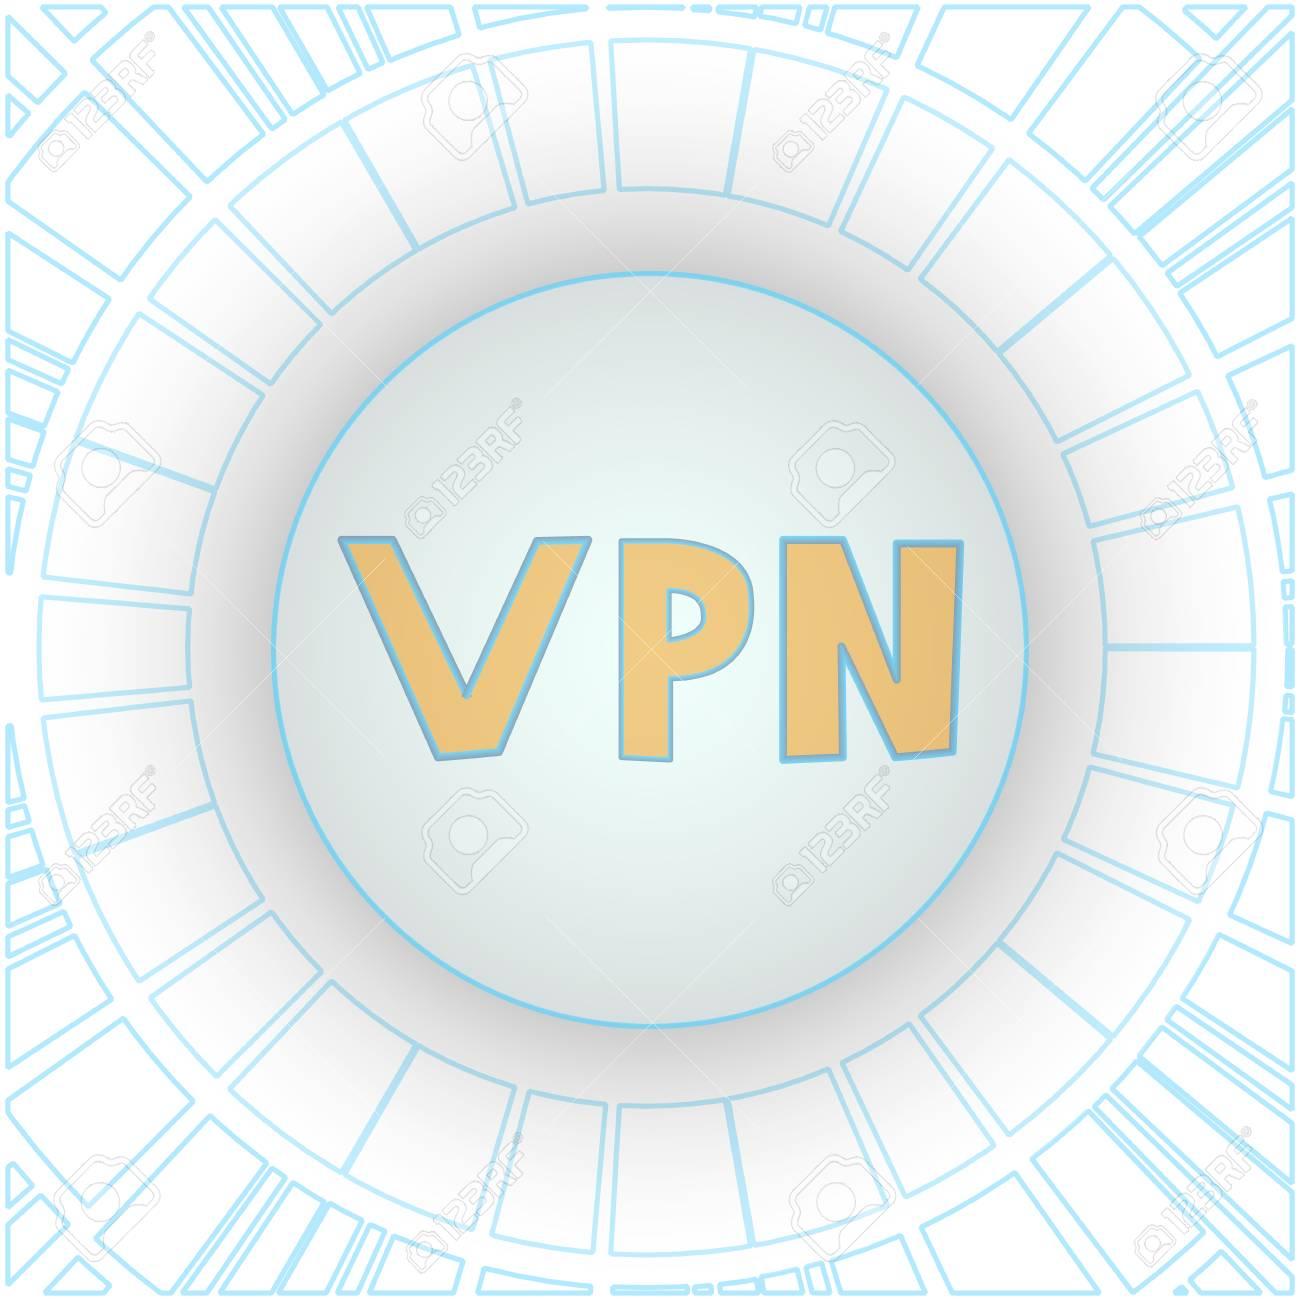 Encryption of Internet traffic using VPN technology  Quad menu